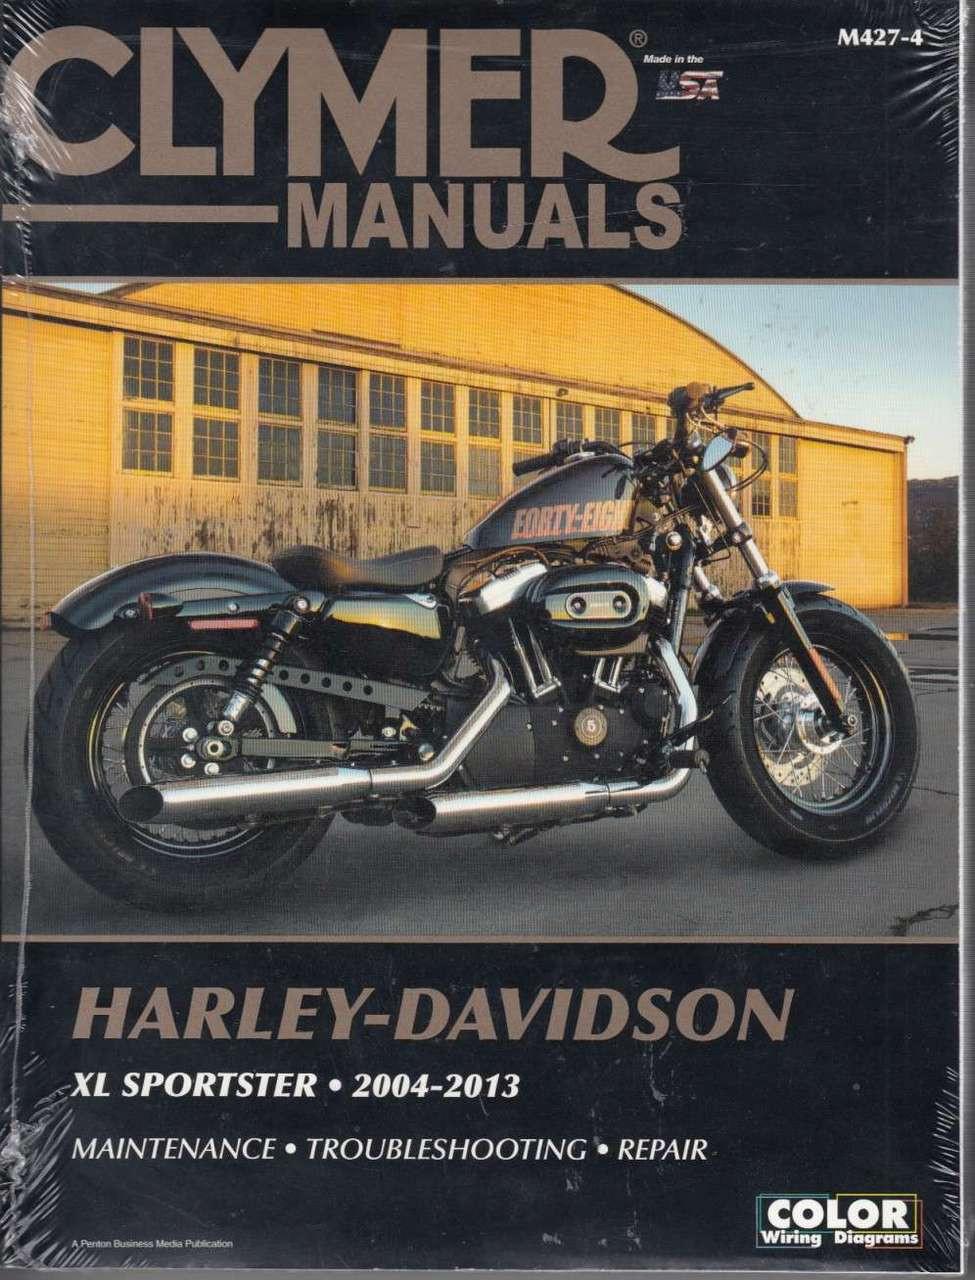 harley davidson xl sportster 2004 2013 workshop manual rh automotobookshop  com au 2003 harley davidson service manual 2003 harley davidson service  manual